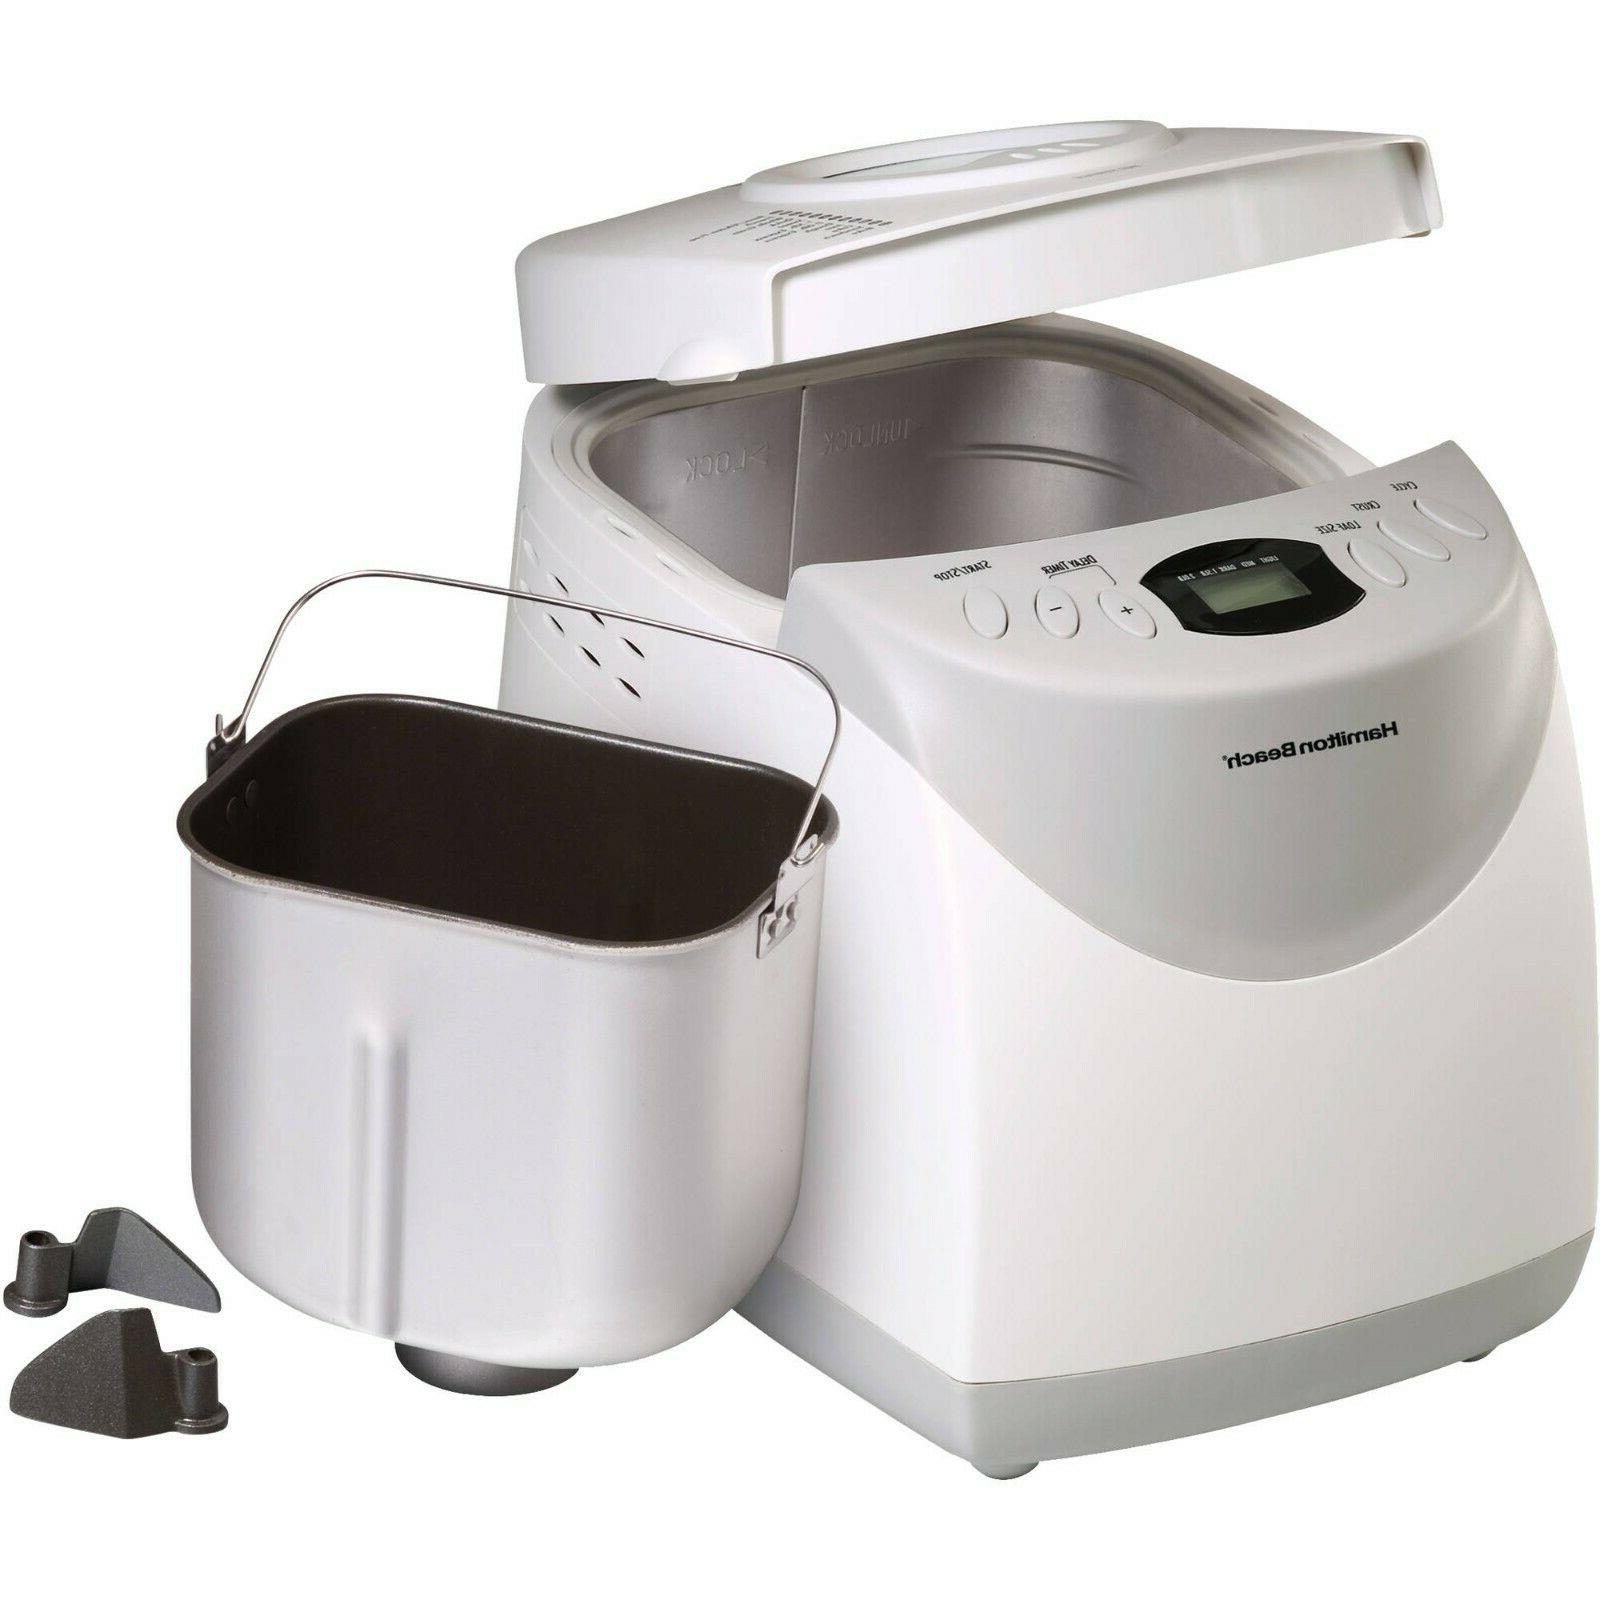 Compact Countertop 2 Digital Bread Machine 12 Settings New